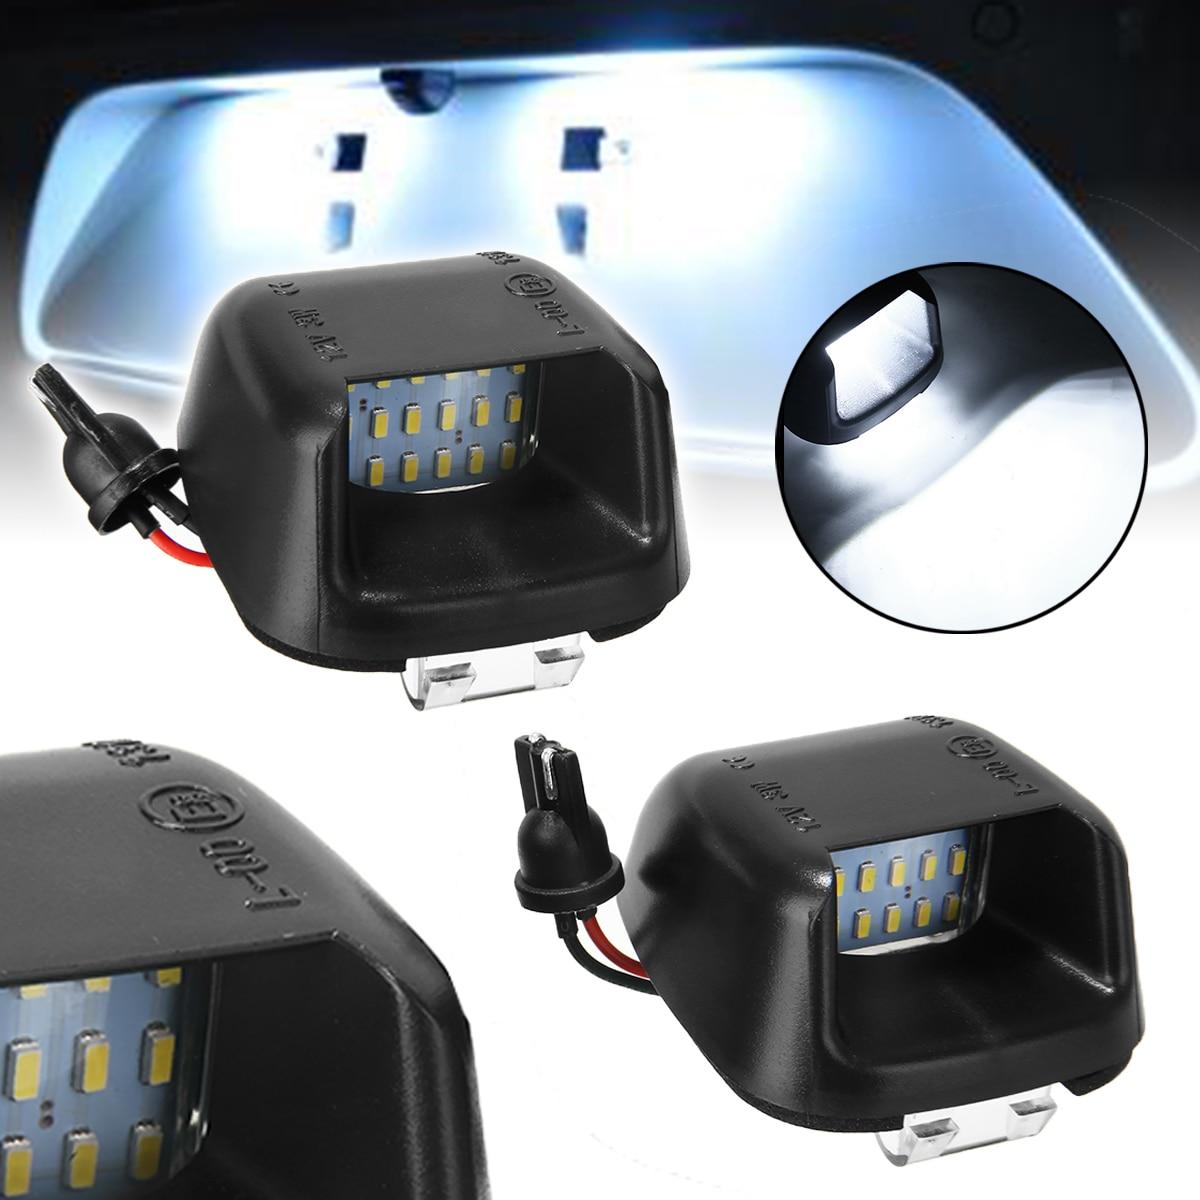 2x 6000k White LED License Plate Light Fits For Nissan Navara D40 Frontier 04-18